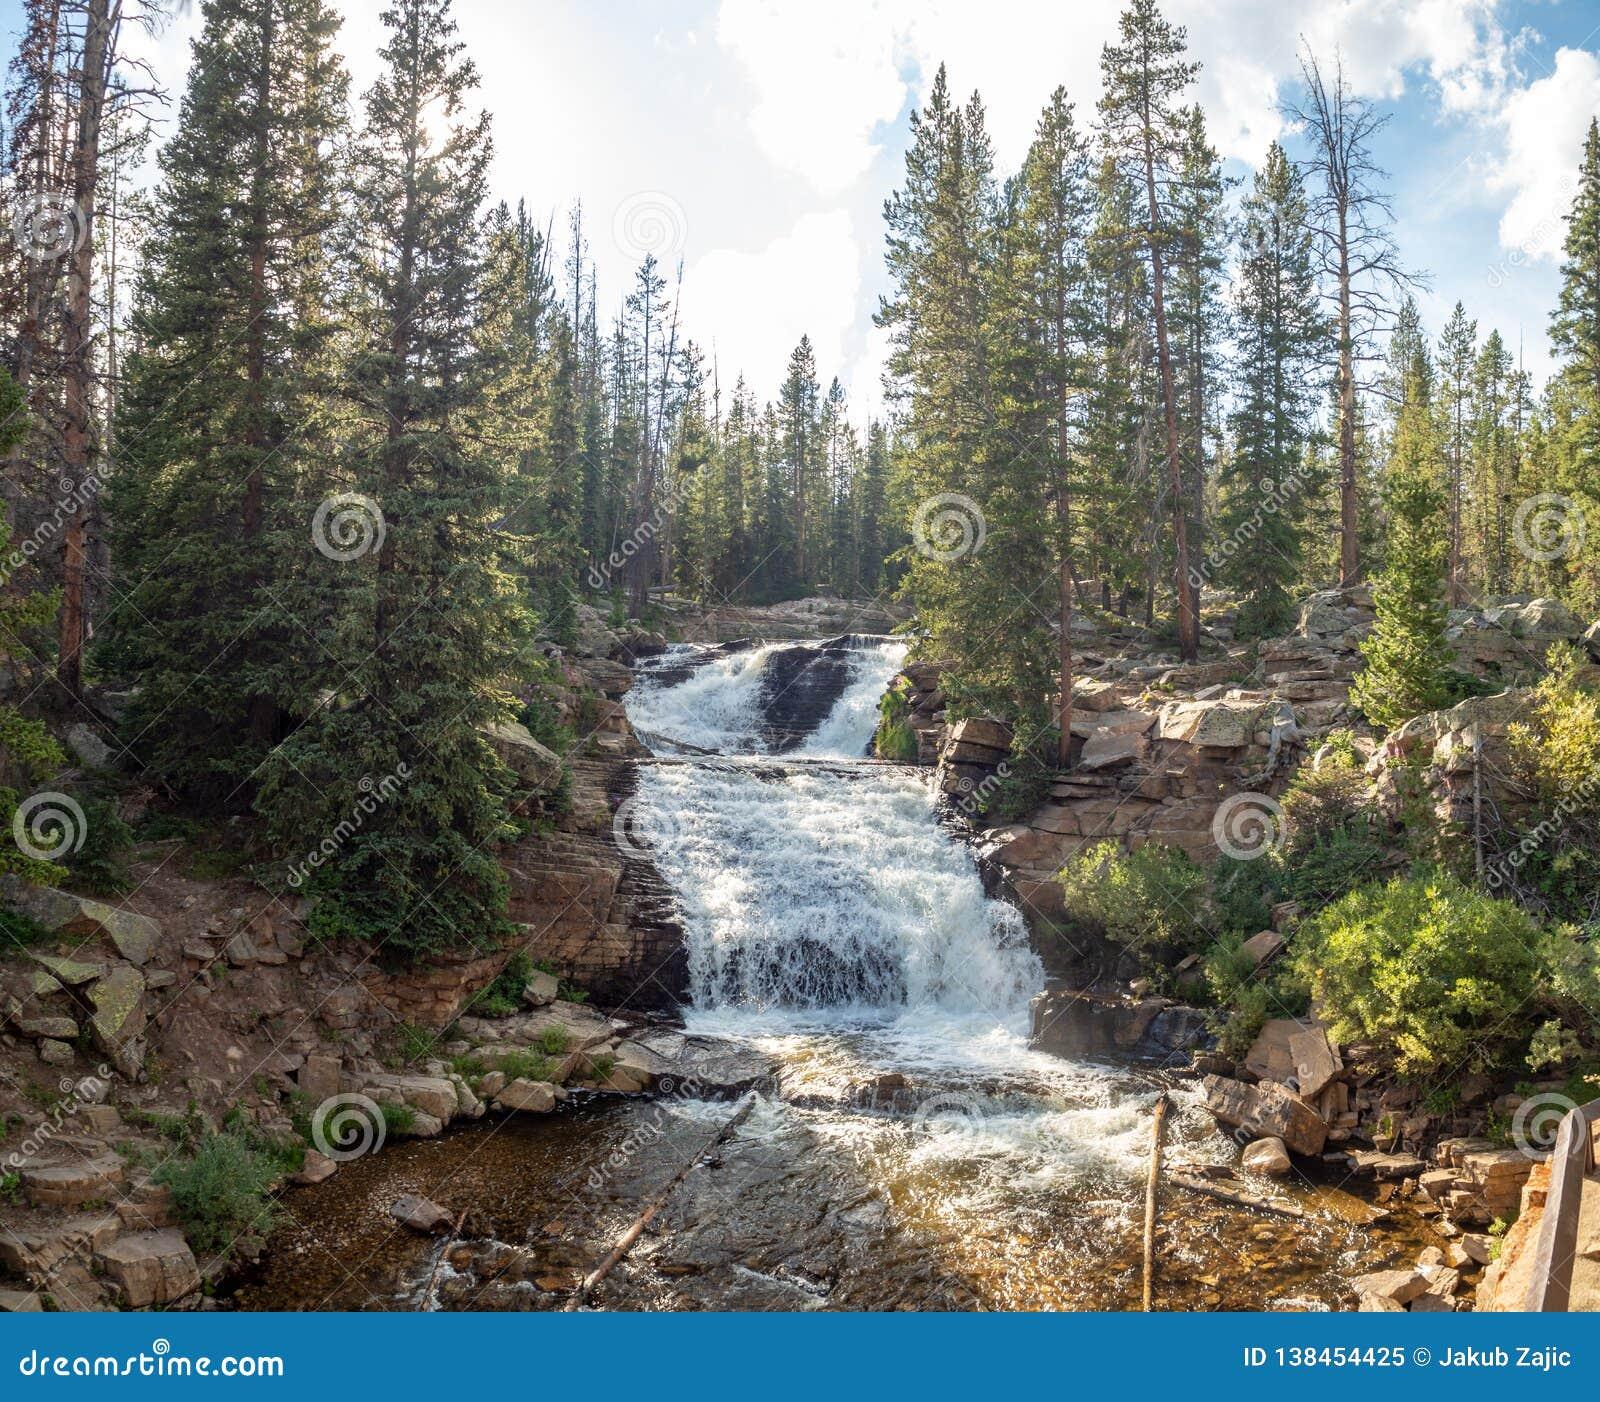 Uinta-Wasatch-Cache National Forest, Mirror Lake, Utah, United States, America, near Slat Lake and Park City